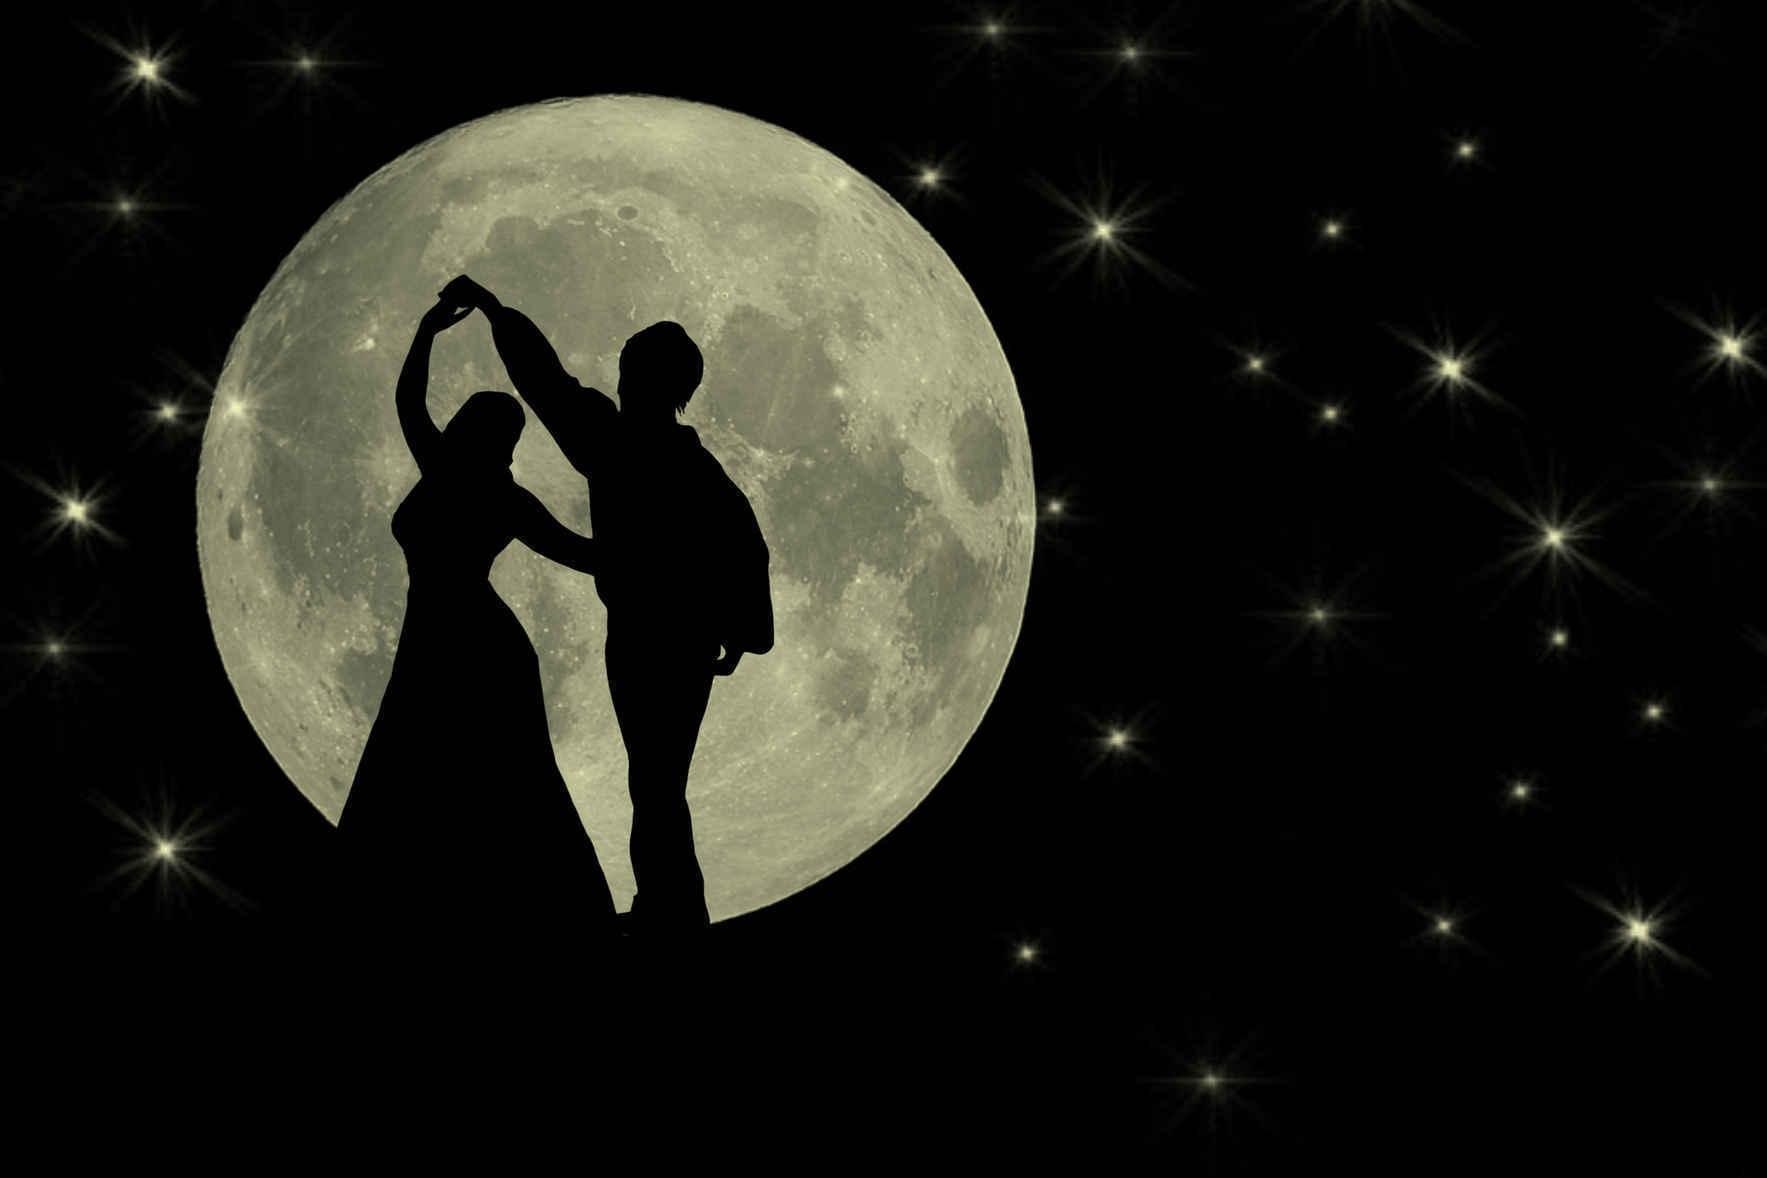 Moonlight & Mittens Gala image